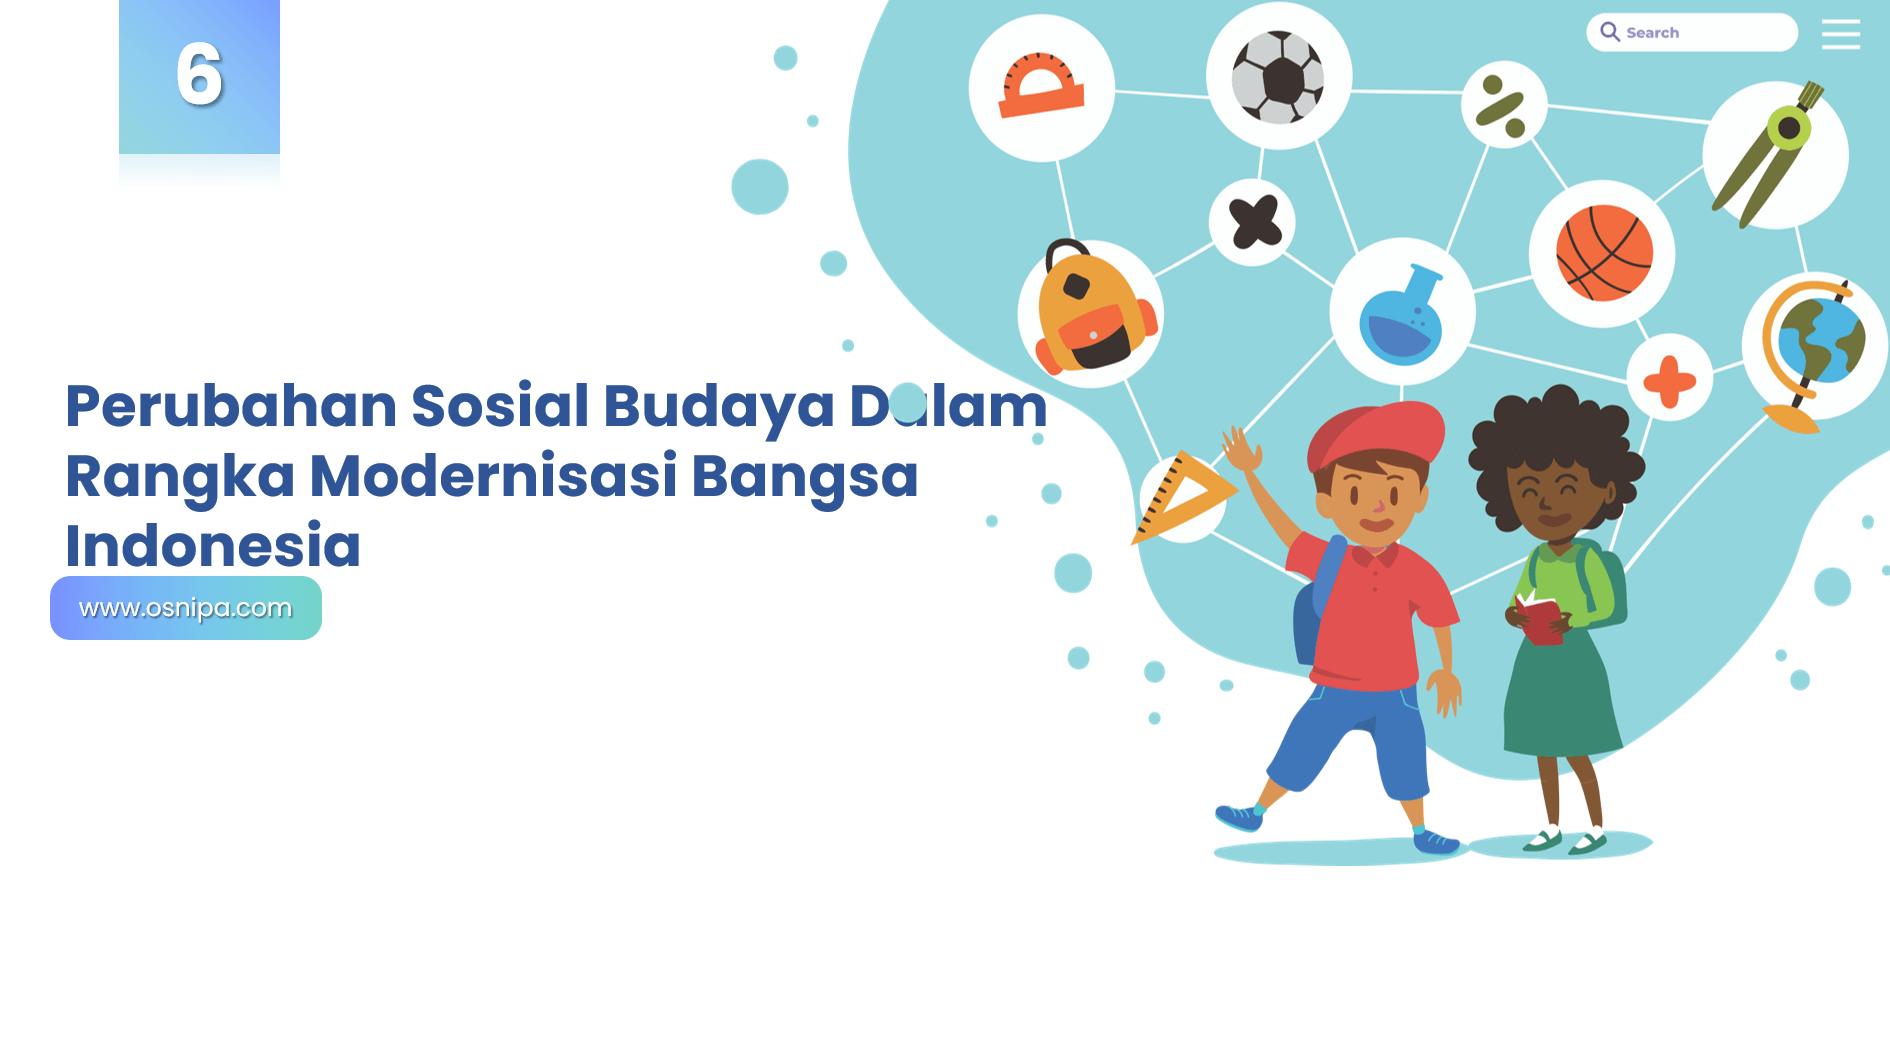 Perubahan Sosial Budaya Dalam Rangka Modernisasi Bangsa Indonesia